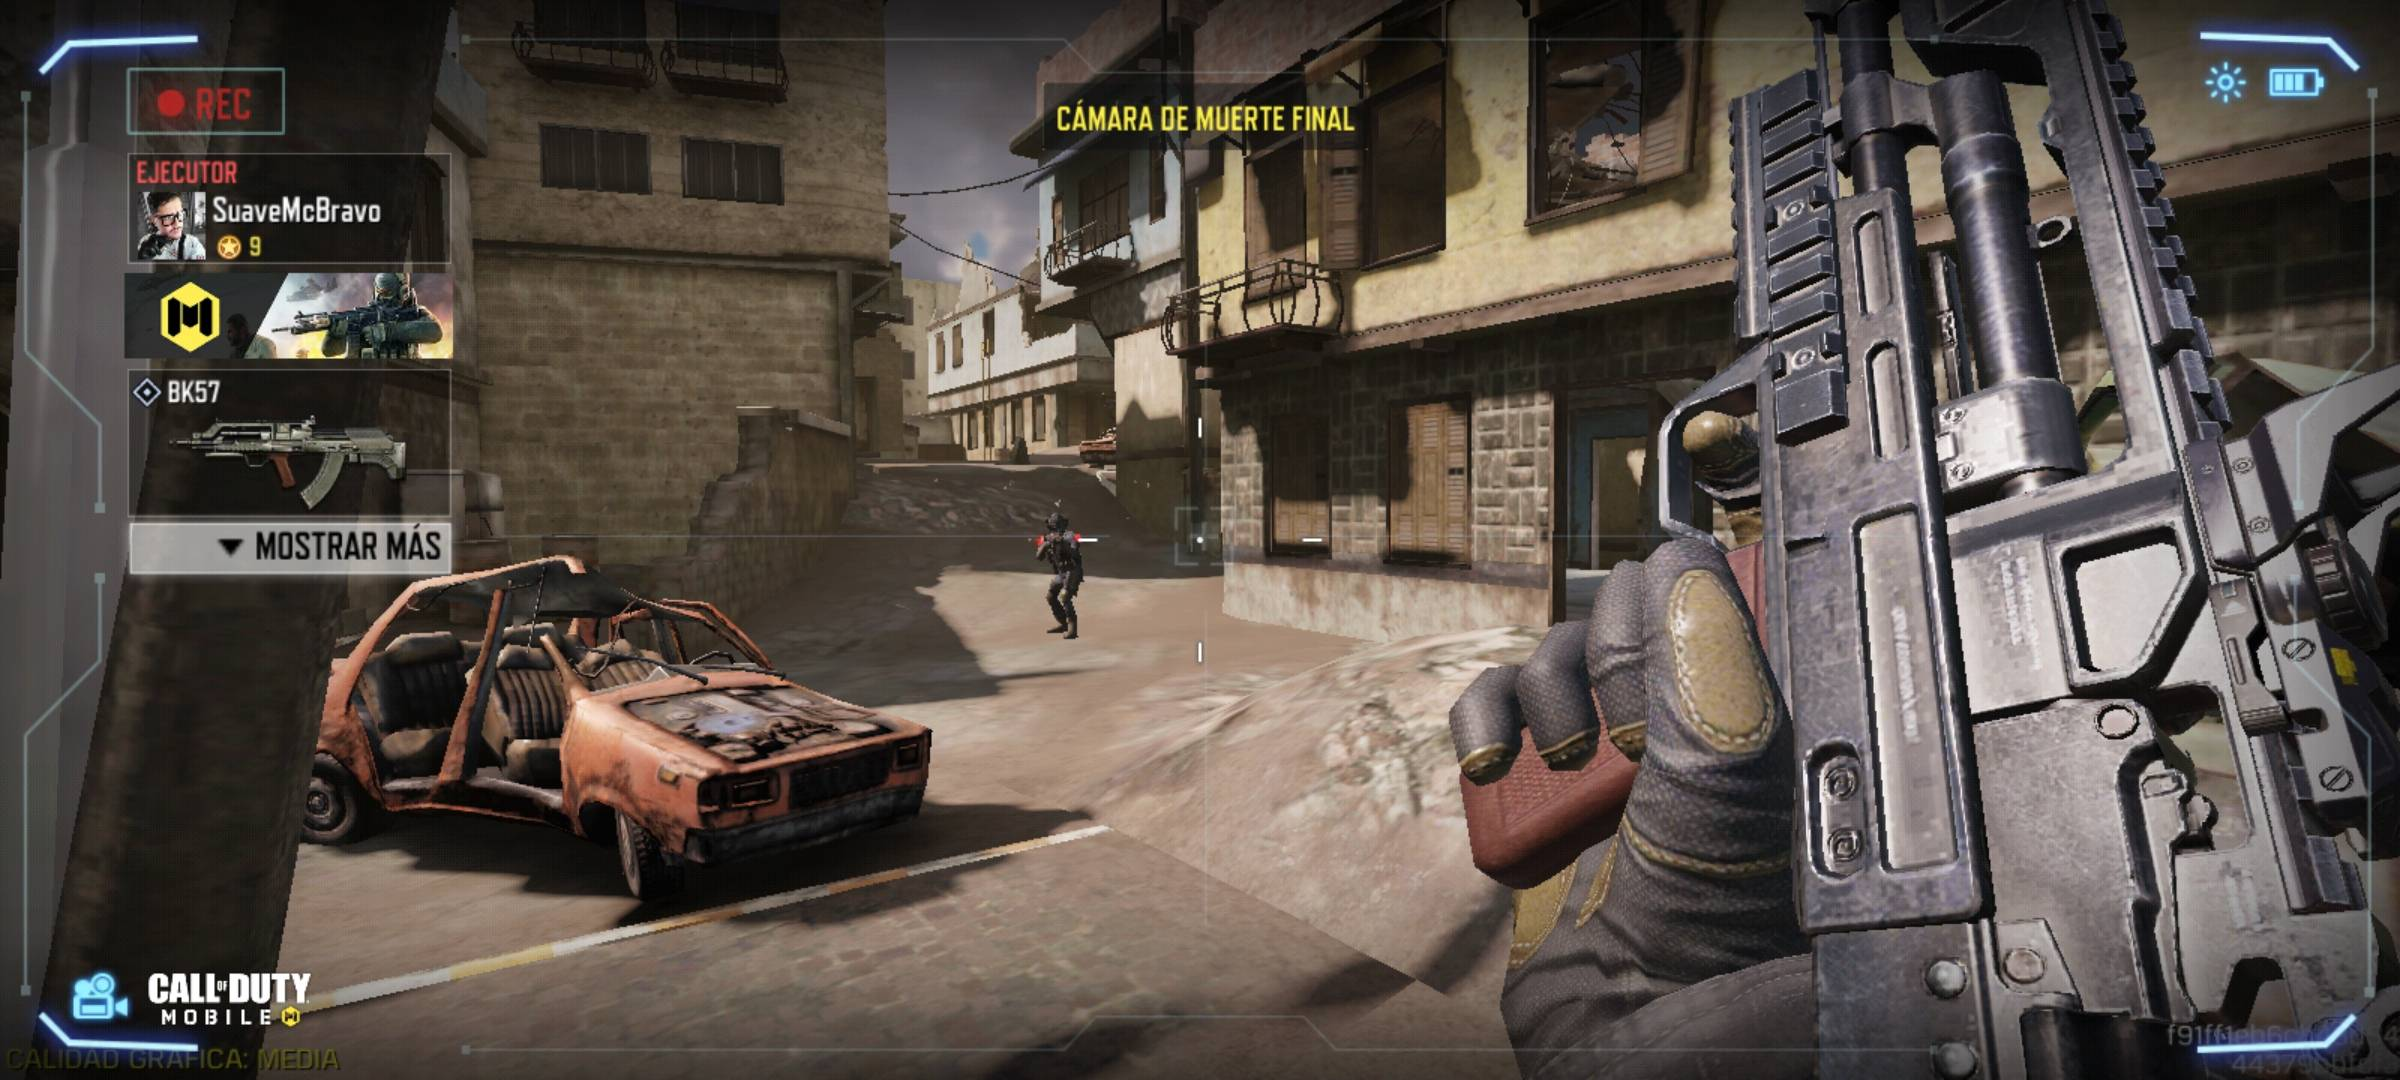 Call of Duty Mobile celulares 2021